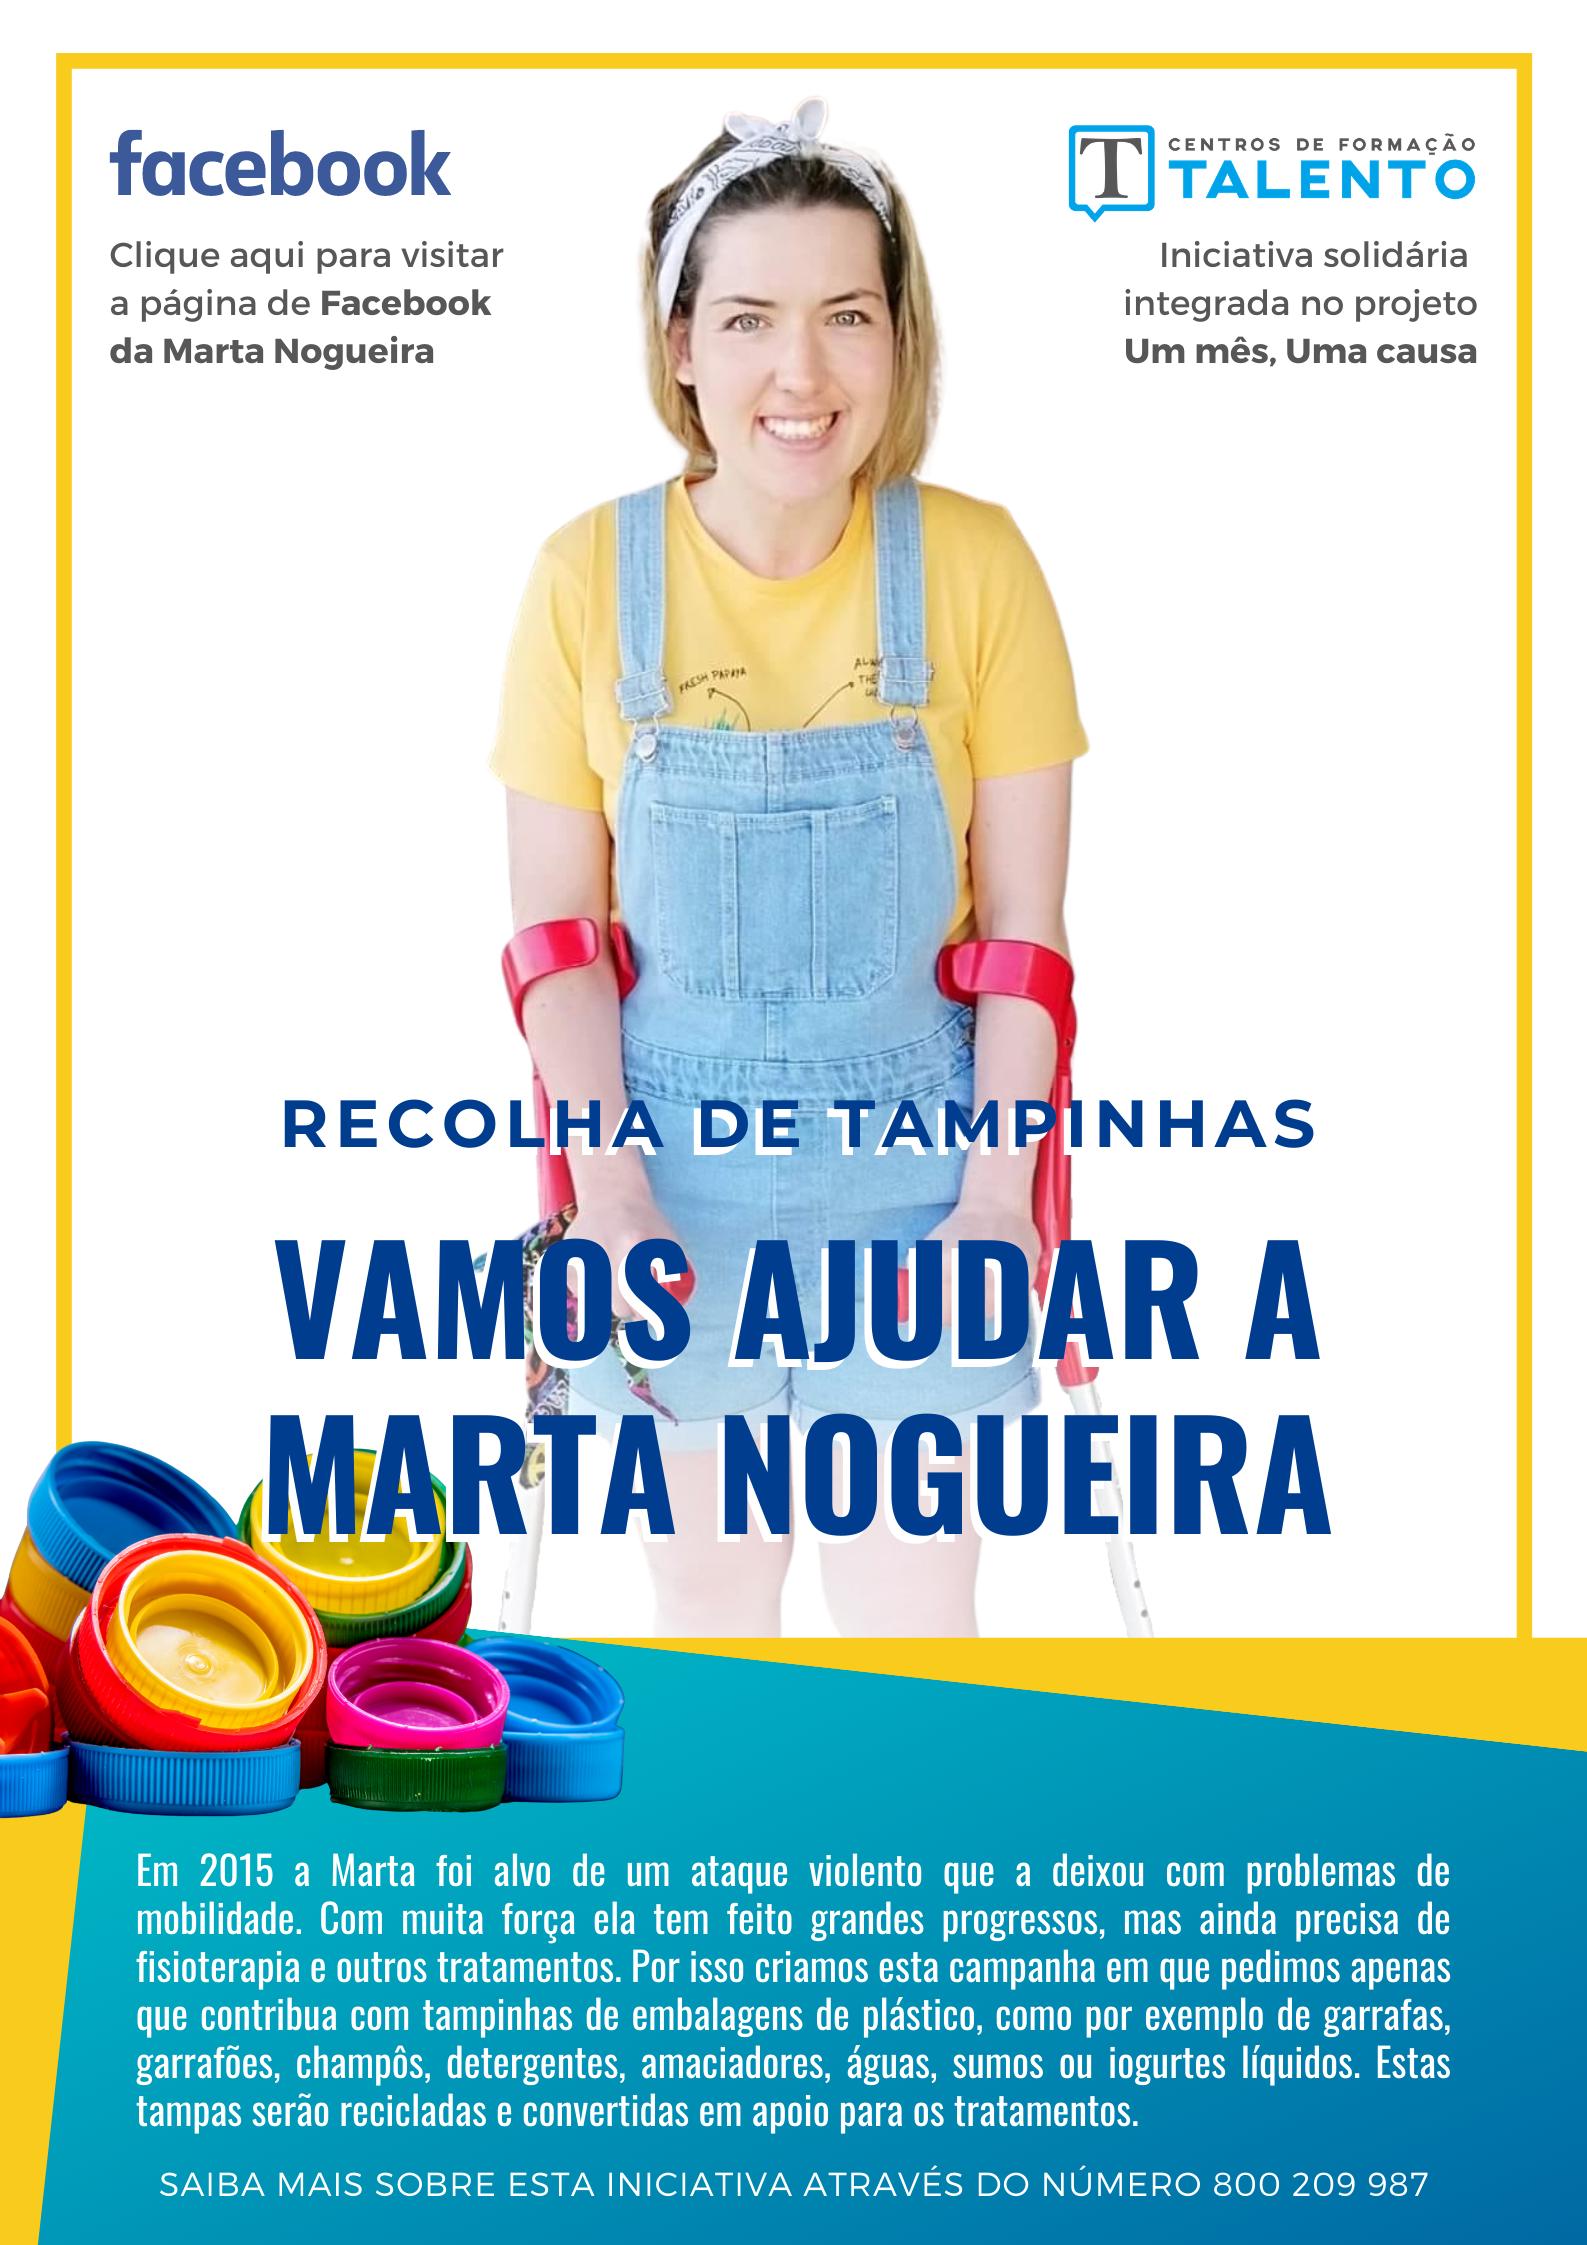 Vamos ajudar a Marta